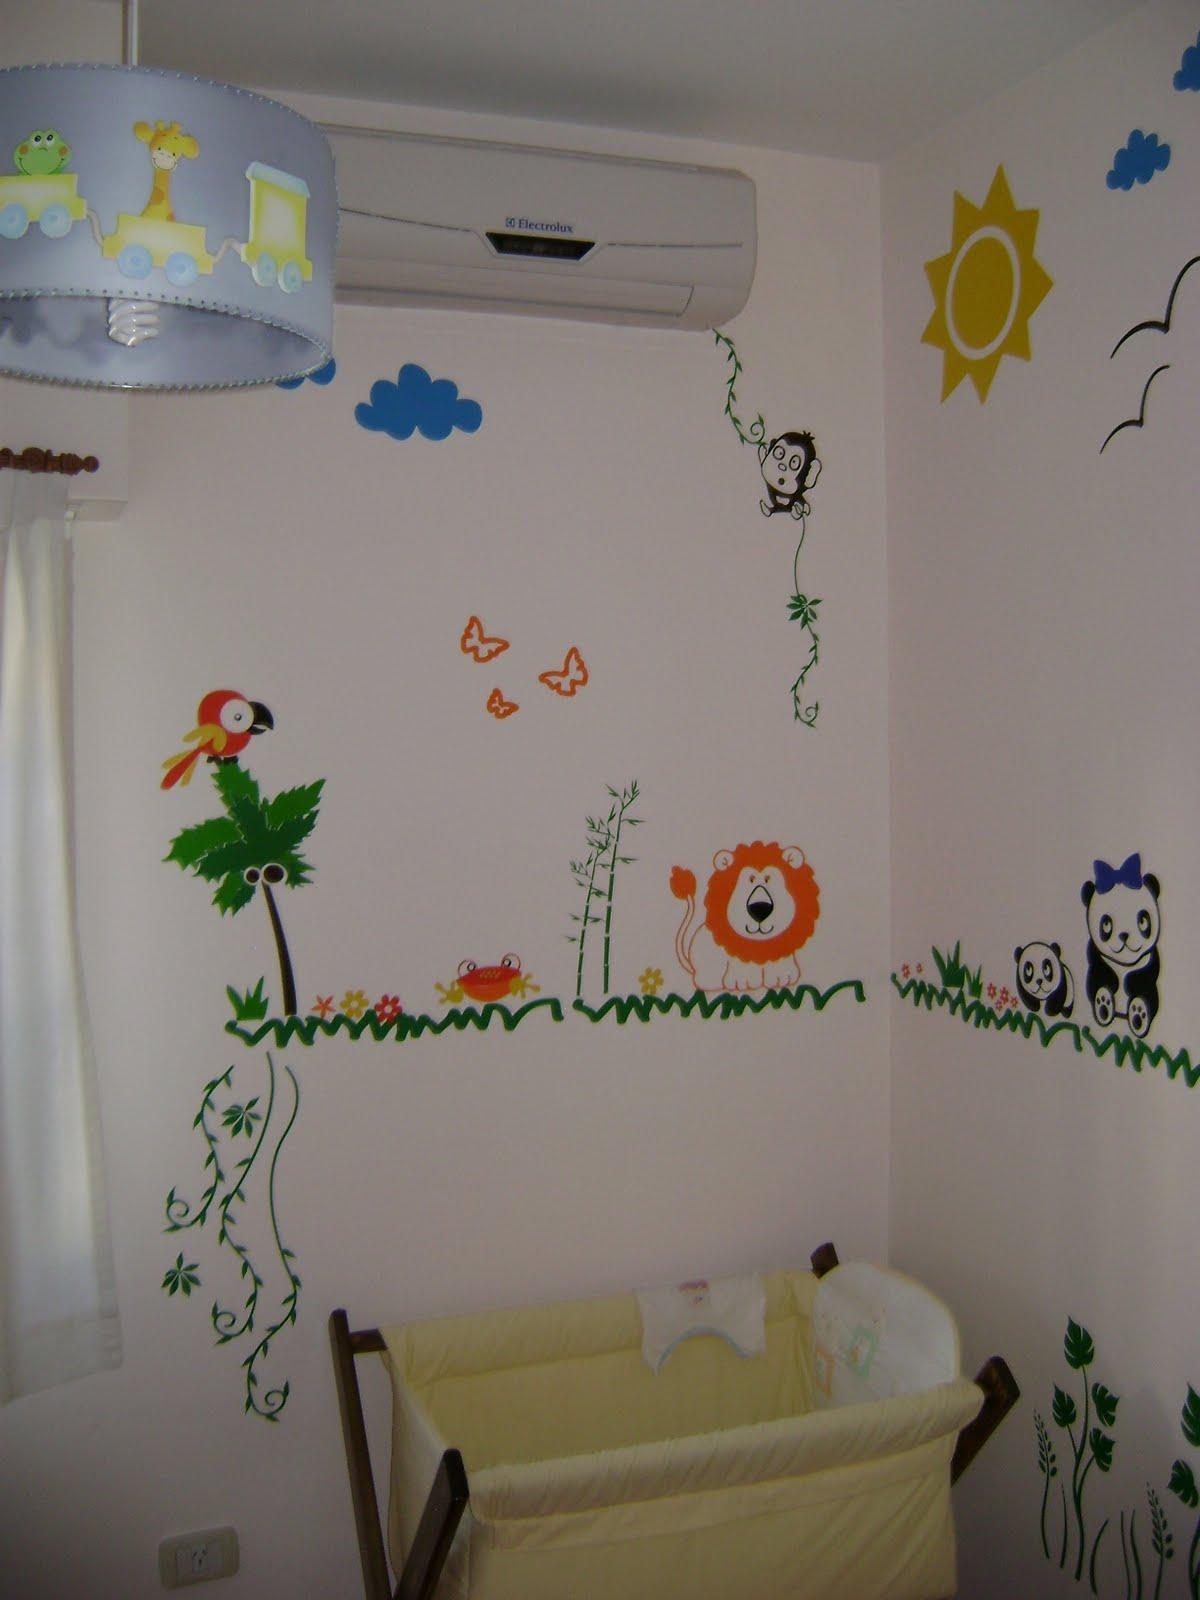 Dibujos vinilos decorativos 2 imagui for Vinilos decorativos infantiles